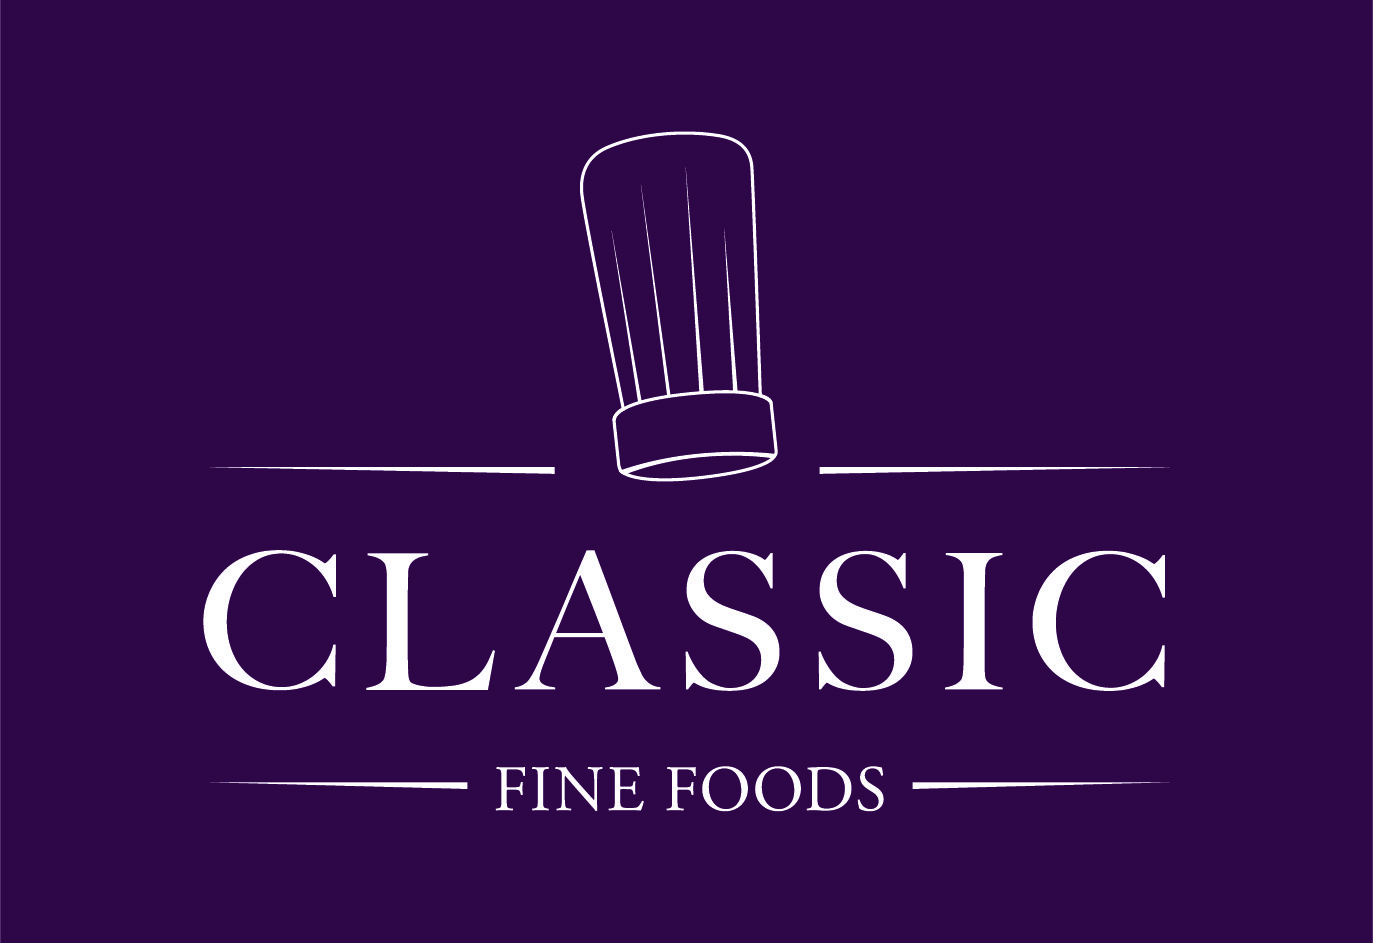 Classic Fine Foods Cmyk 01 (2)